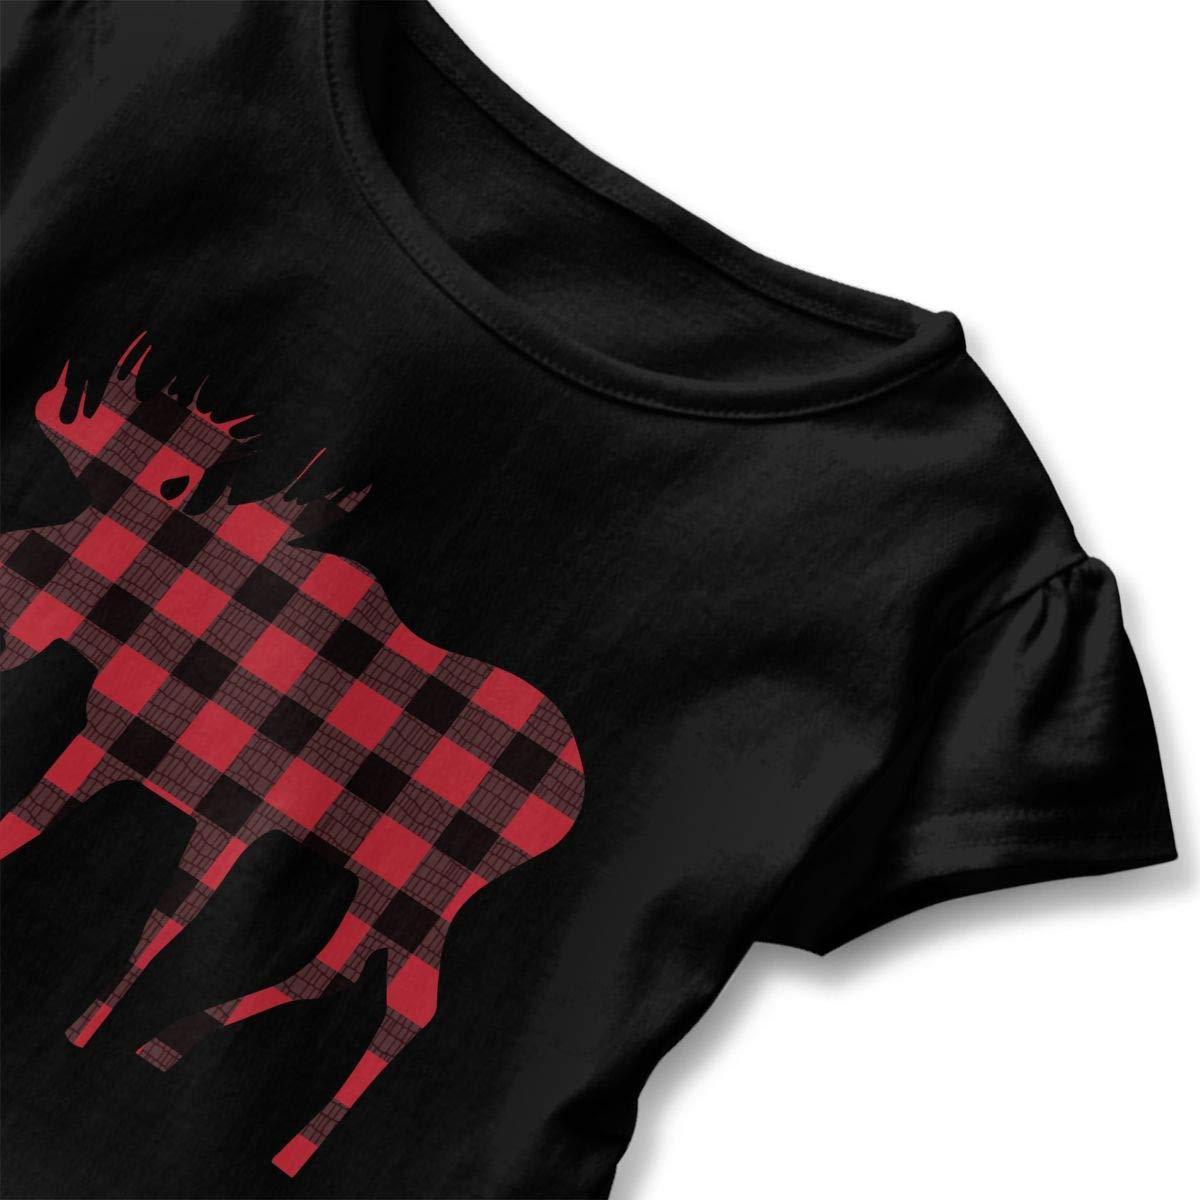 Buffalo Plaid Moose Red Black Toddler//Infant Girls Short Sleeve Ruffles Shirt T-Shirt for 2-6T